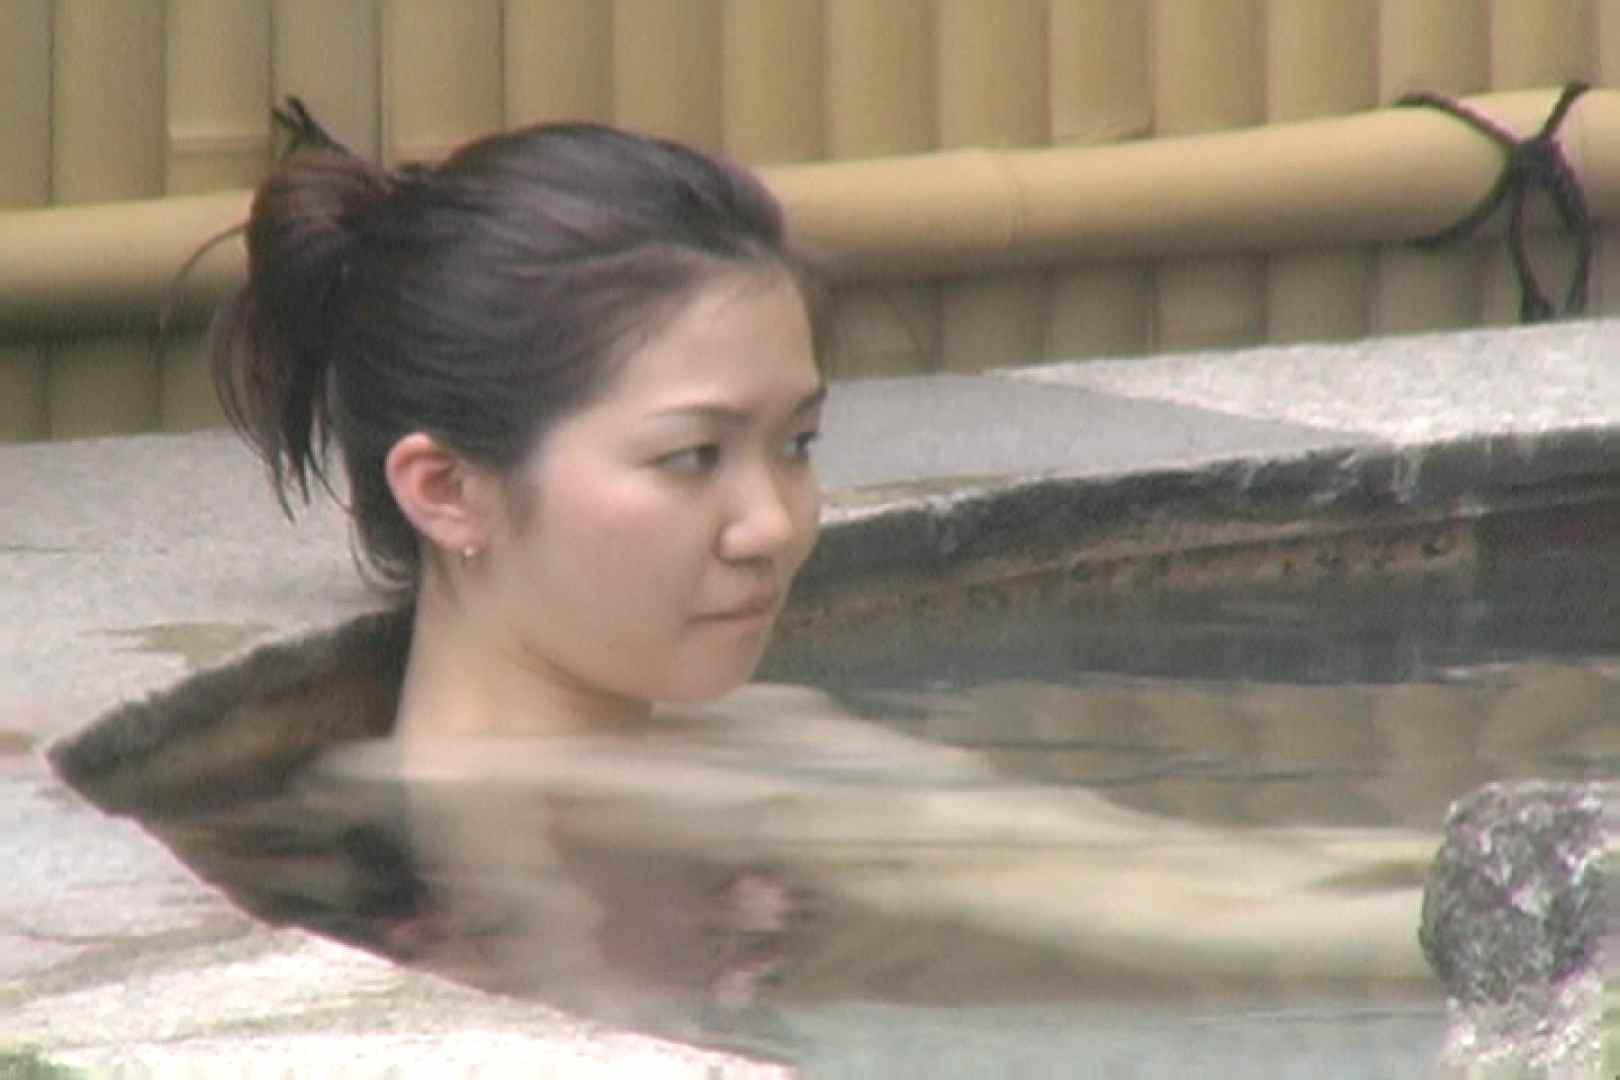 Aquaな露天風呂Vol.641 HなOL | 露天  50pic 25